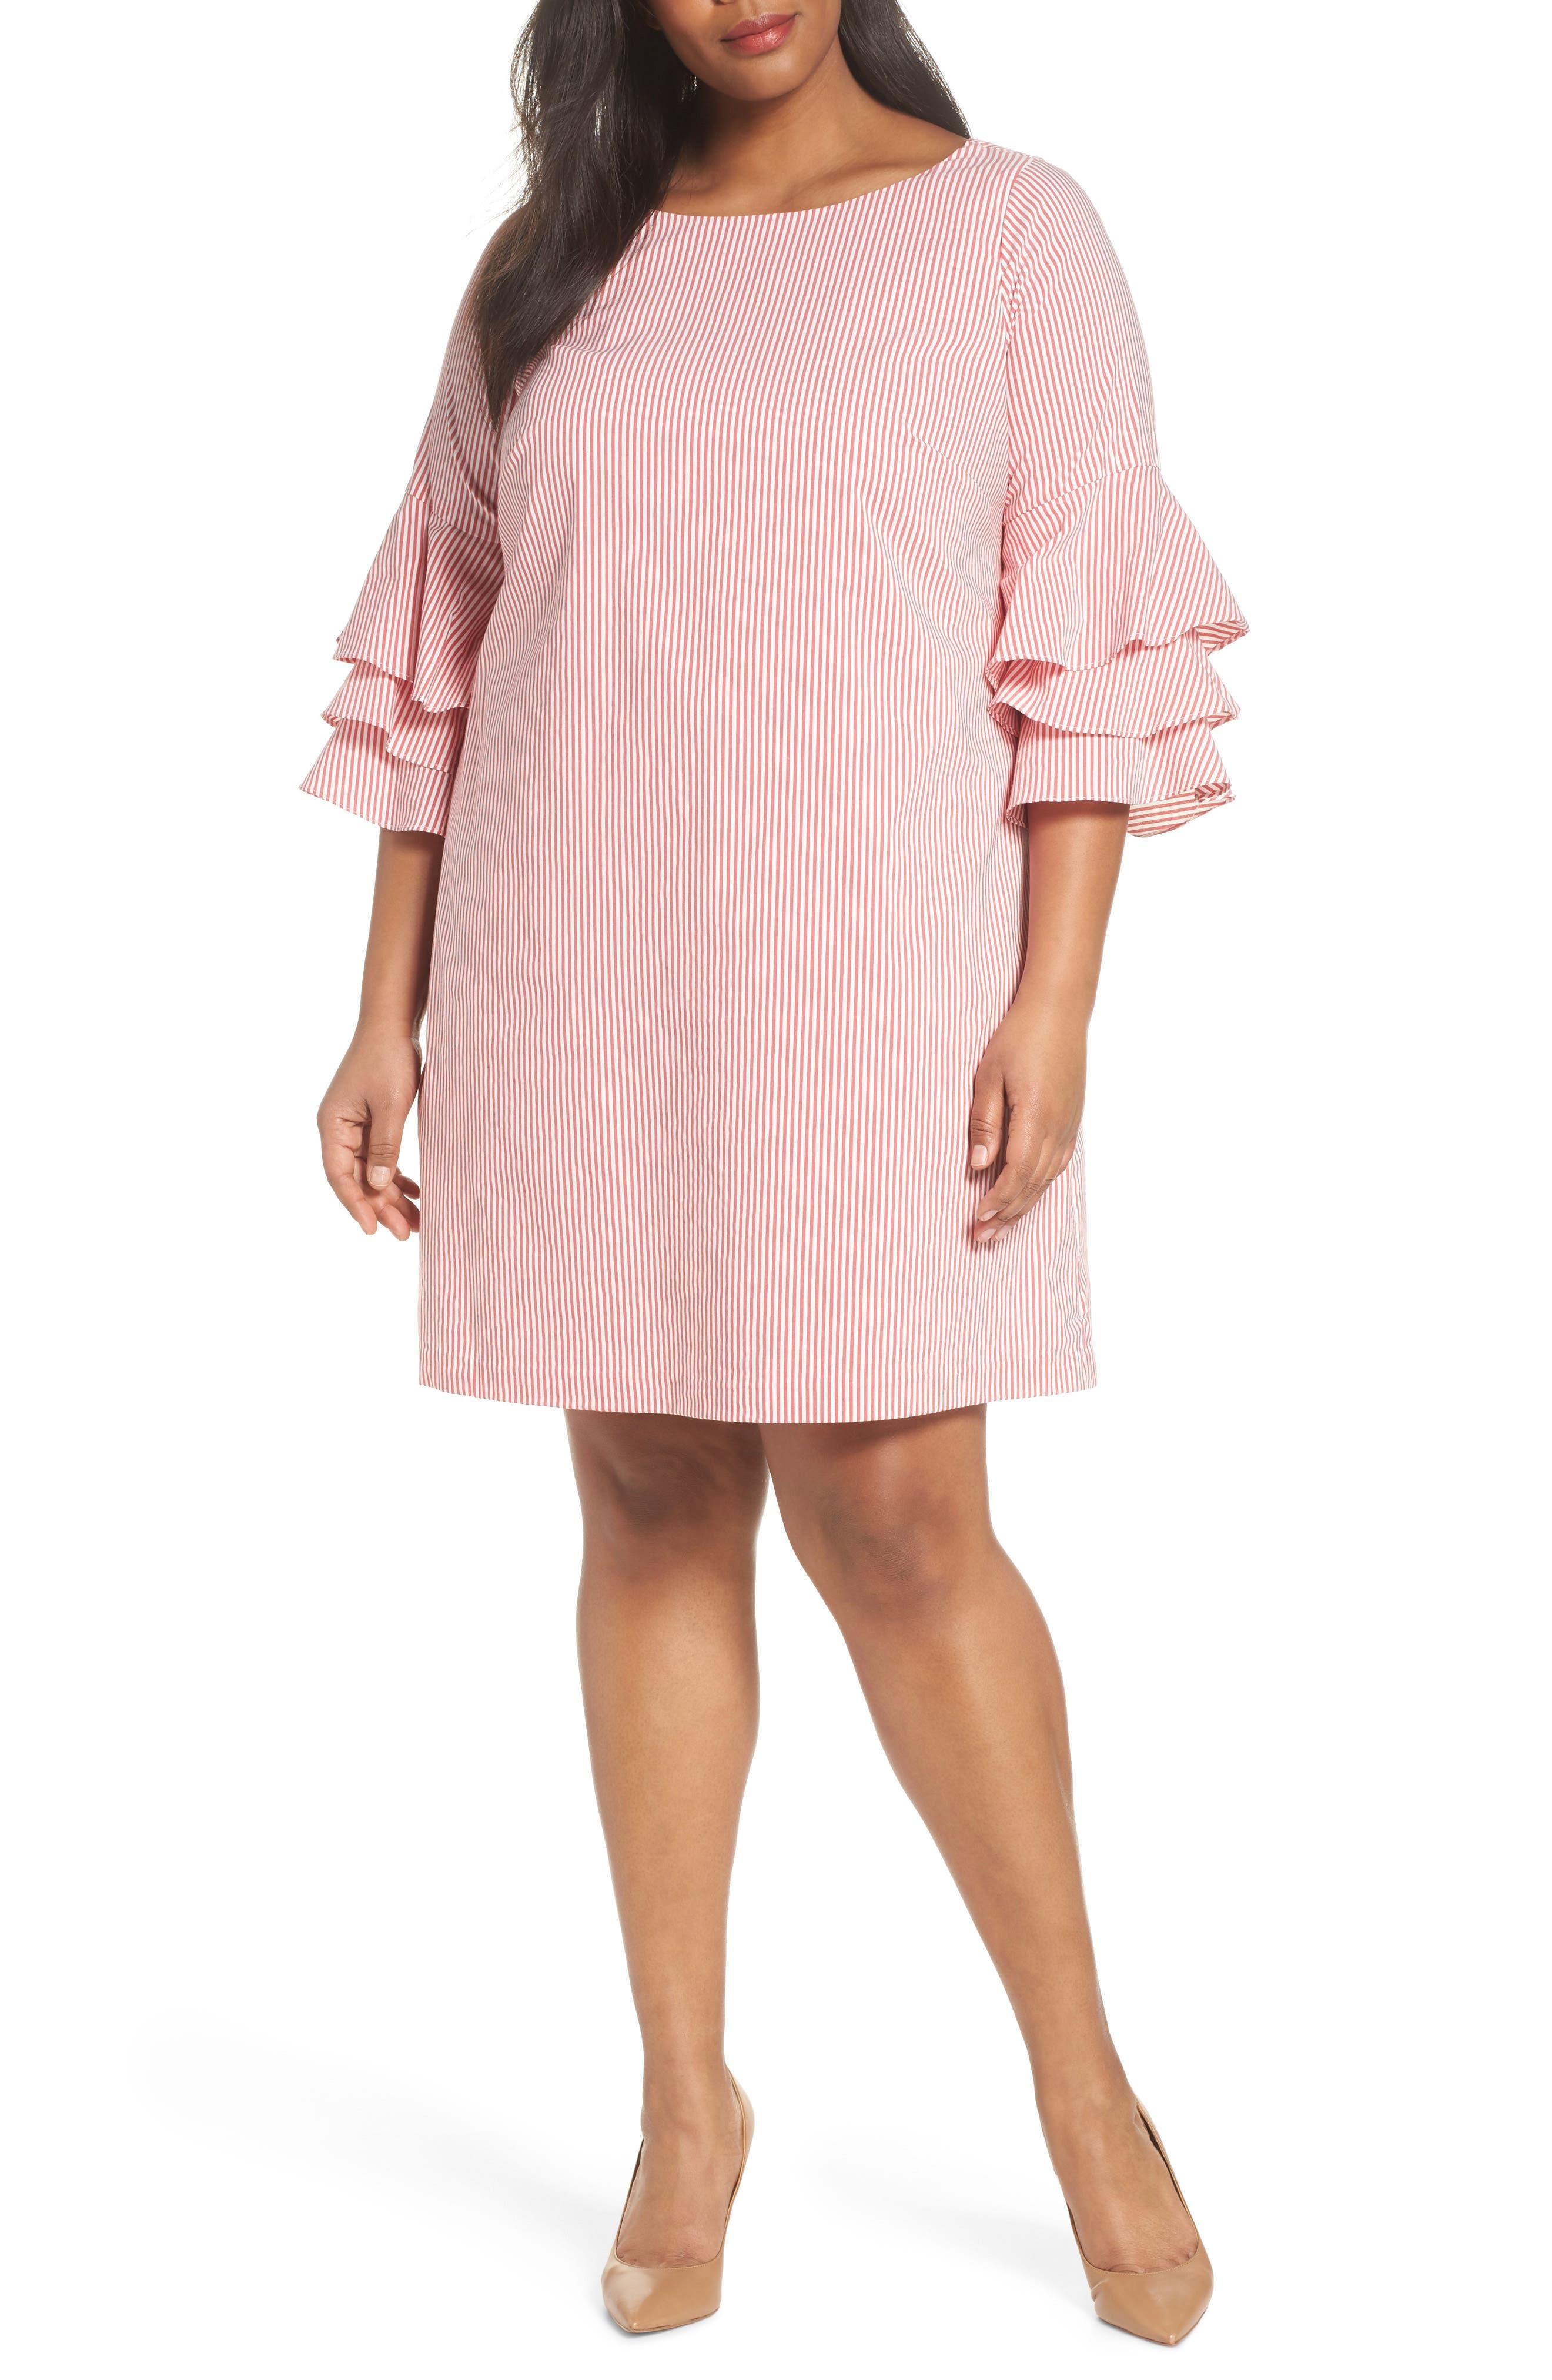 Adrianna Papell Ruffle Sleeve Stripe Shift Dress (Plus Size)